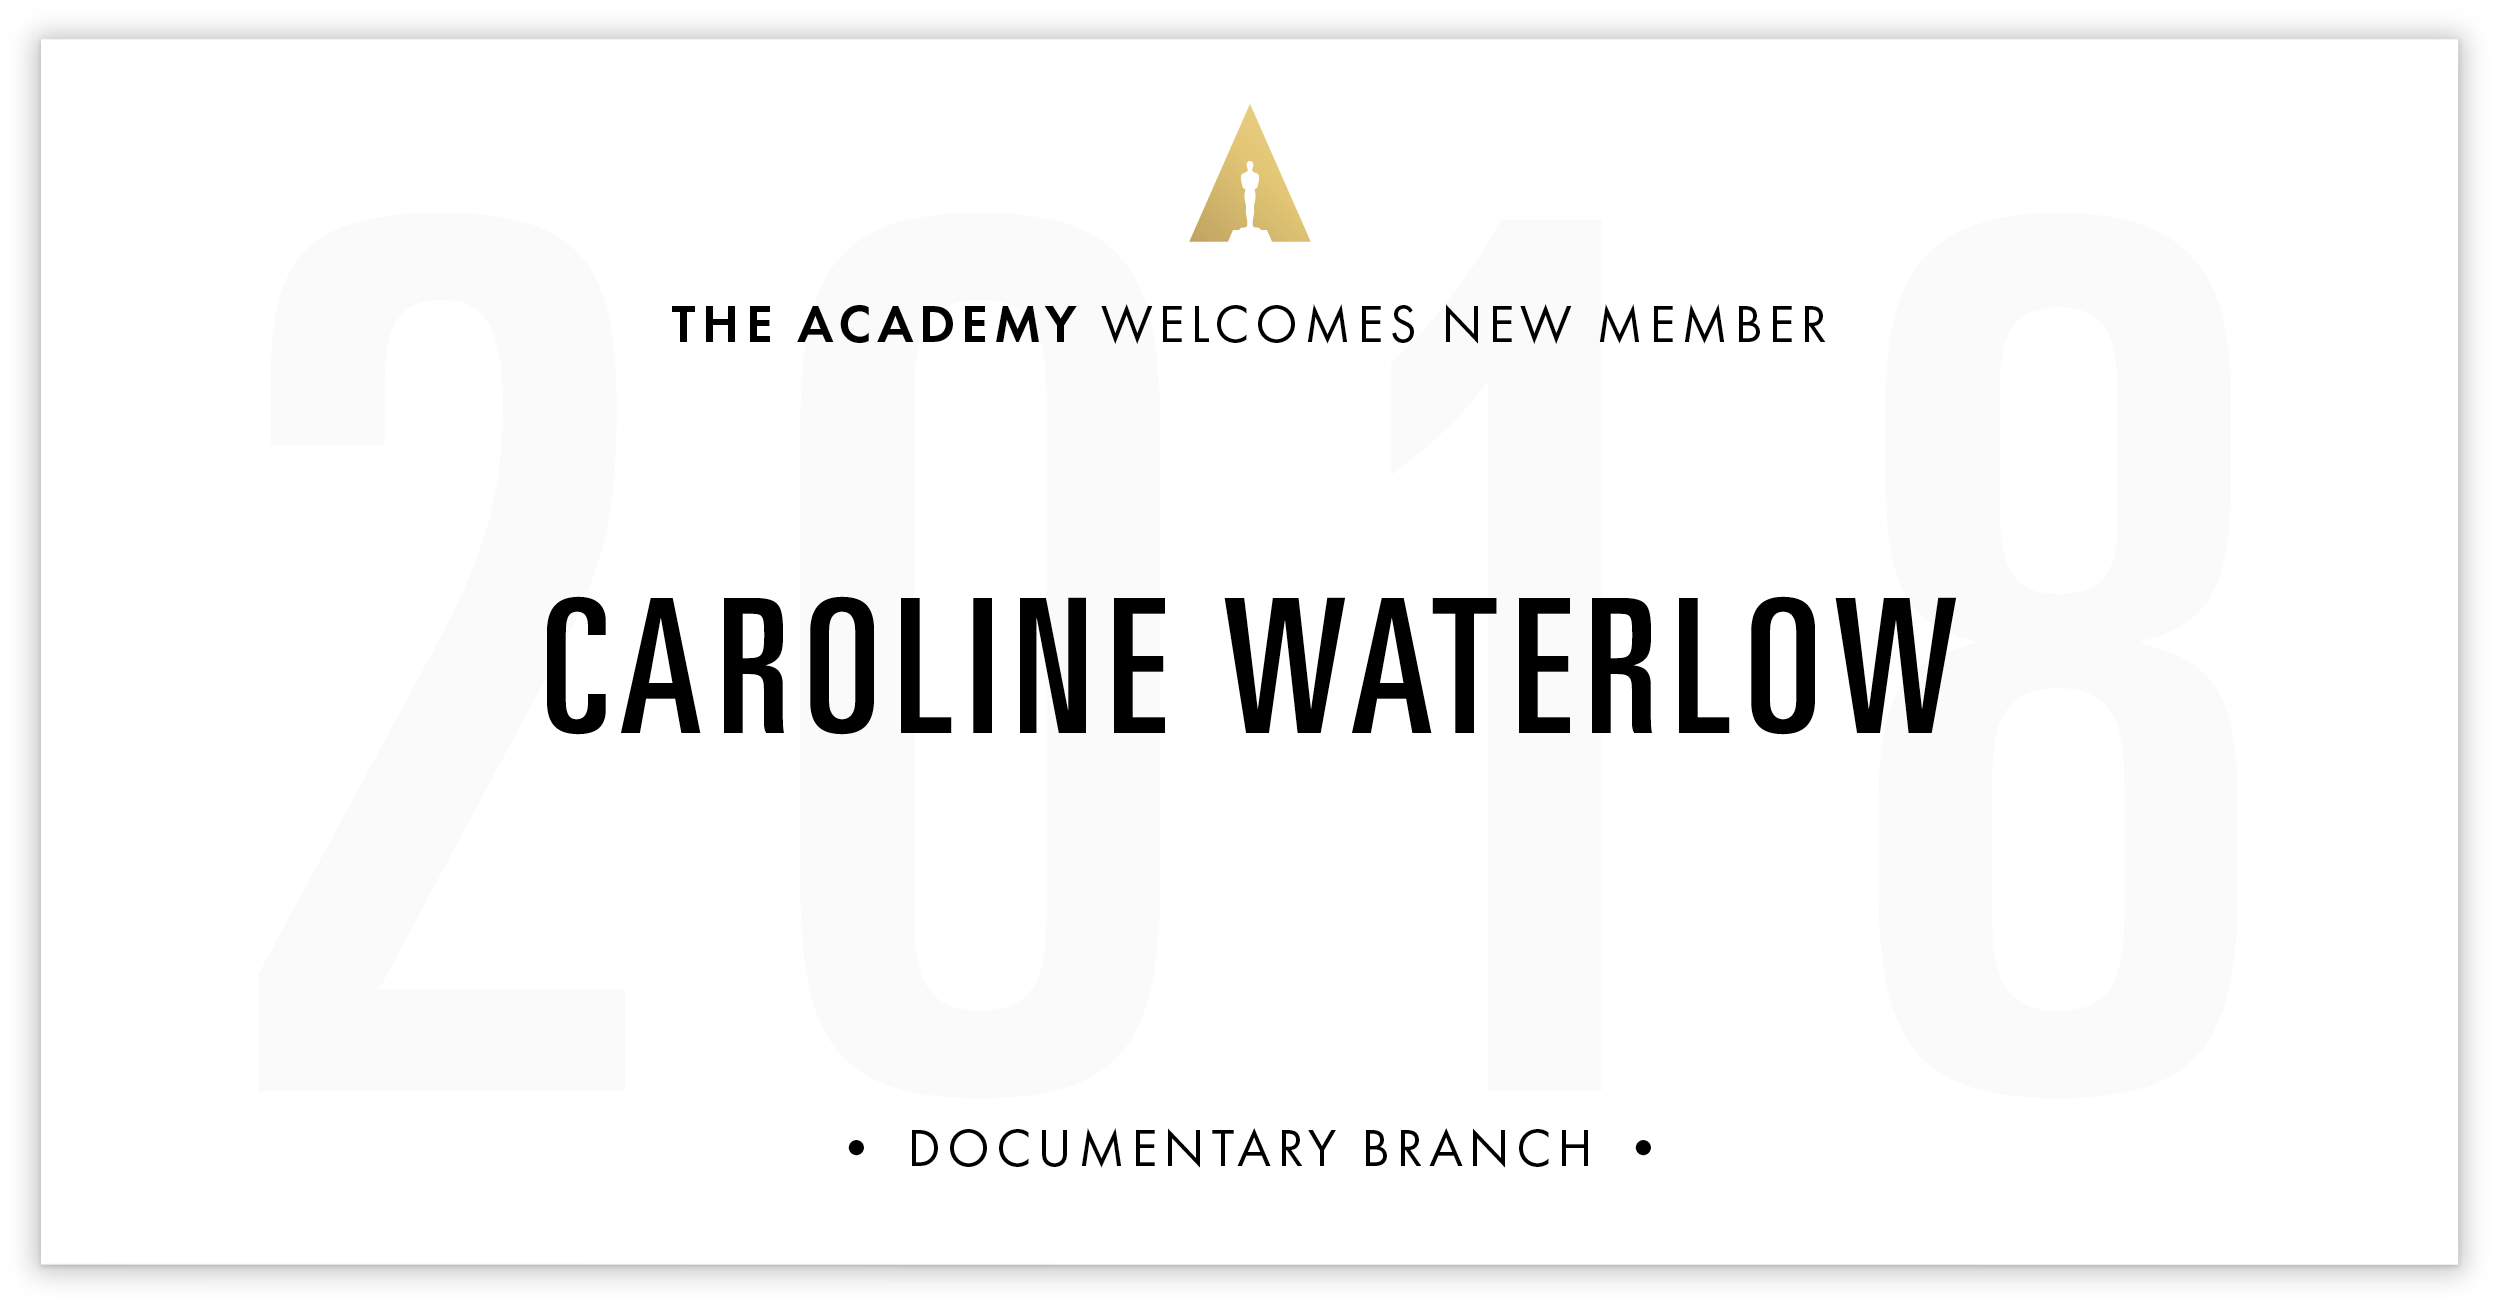 Caroline Waterlow is invited!